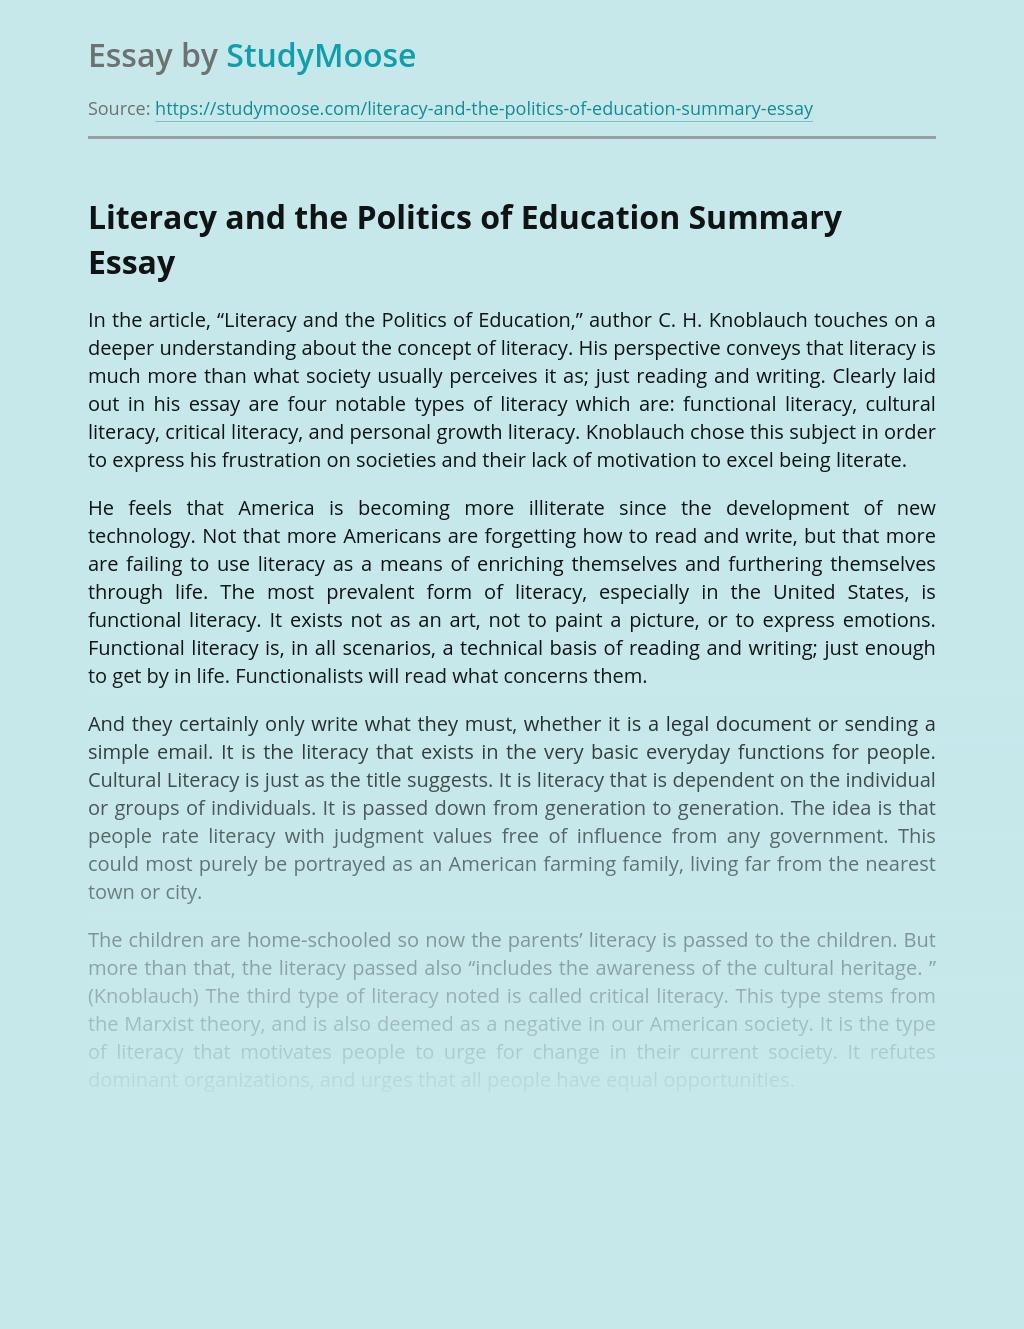 Literacy and the Politics of Education Summary